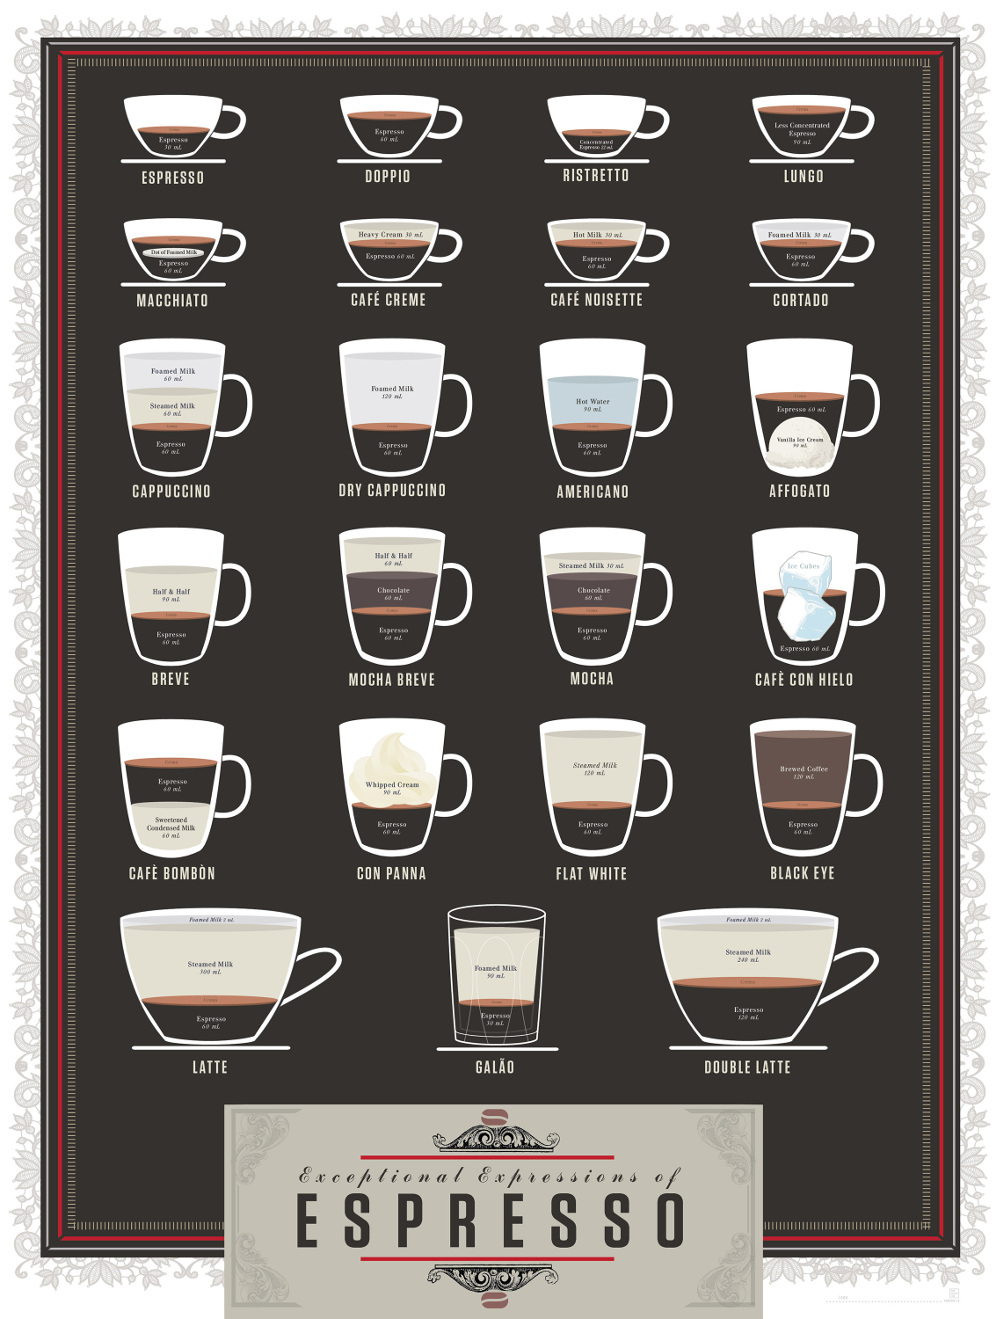 espresso-field-guide.jpg